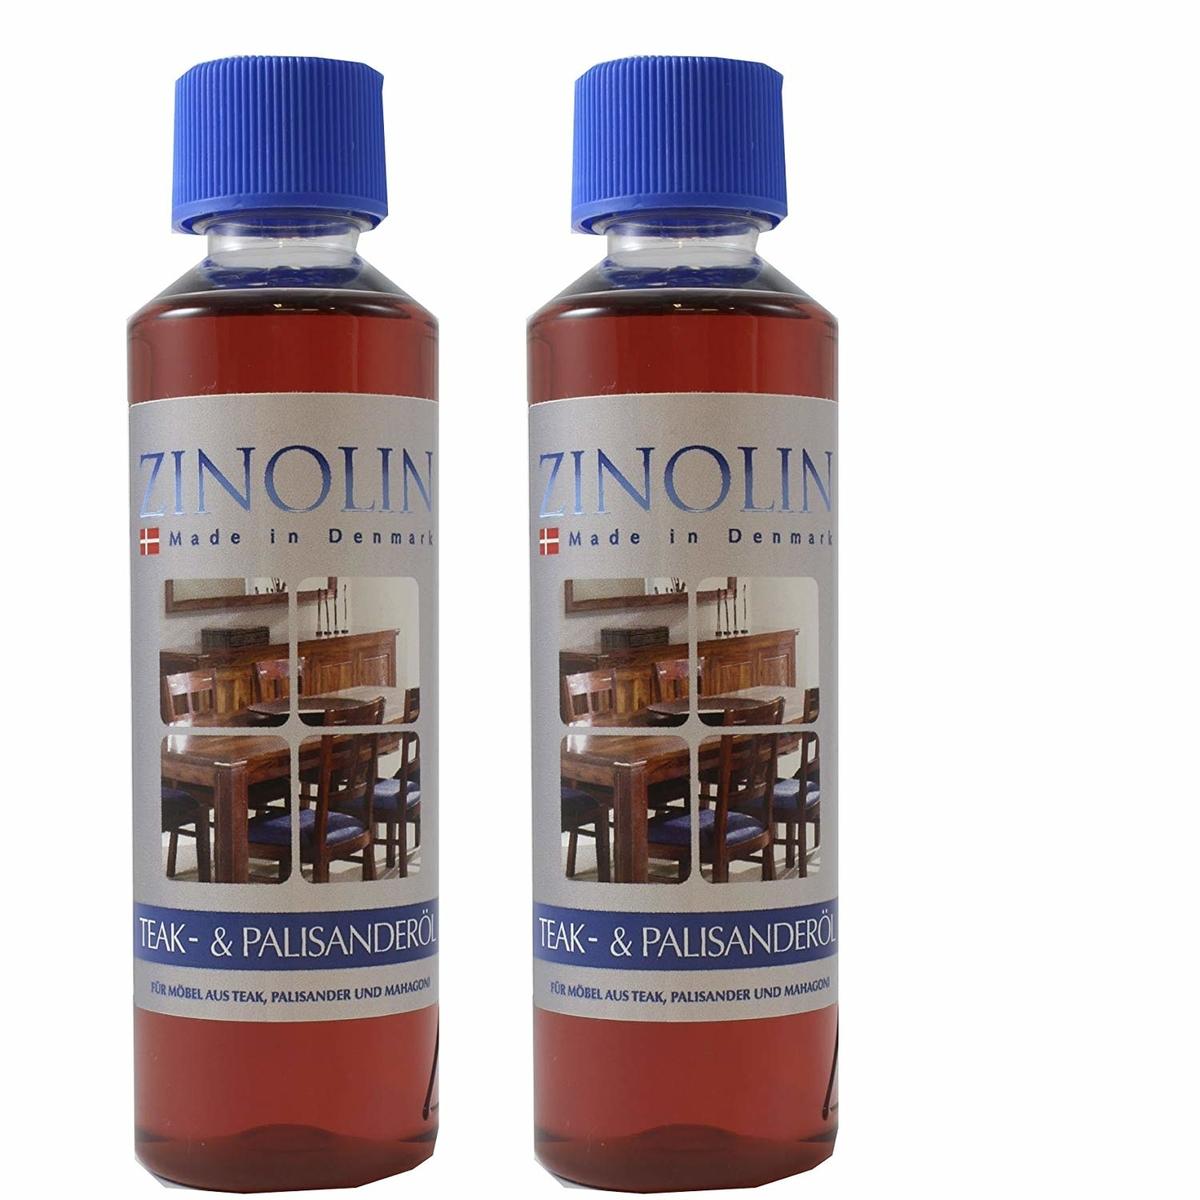 Zinolin Teak- und Palisanderöl, Bild 2